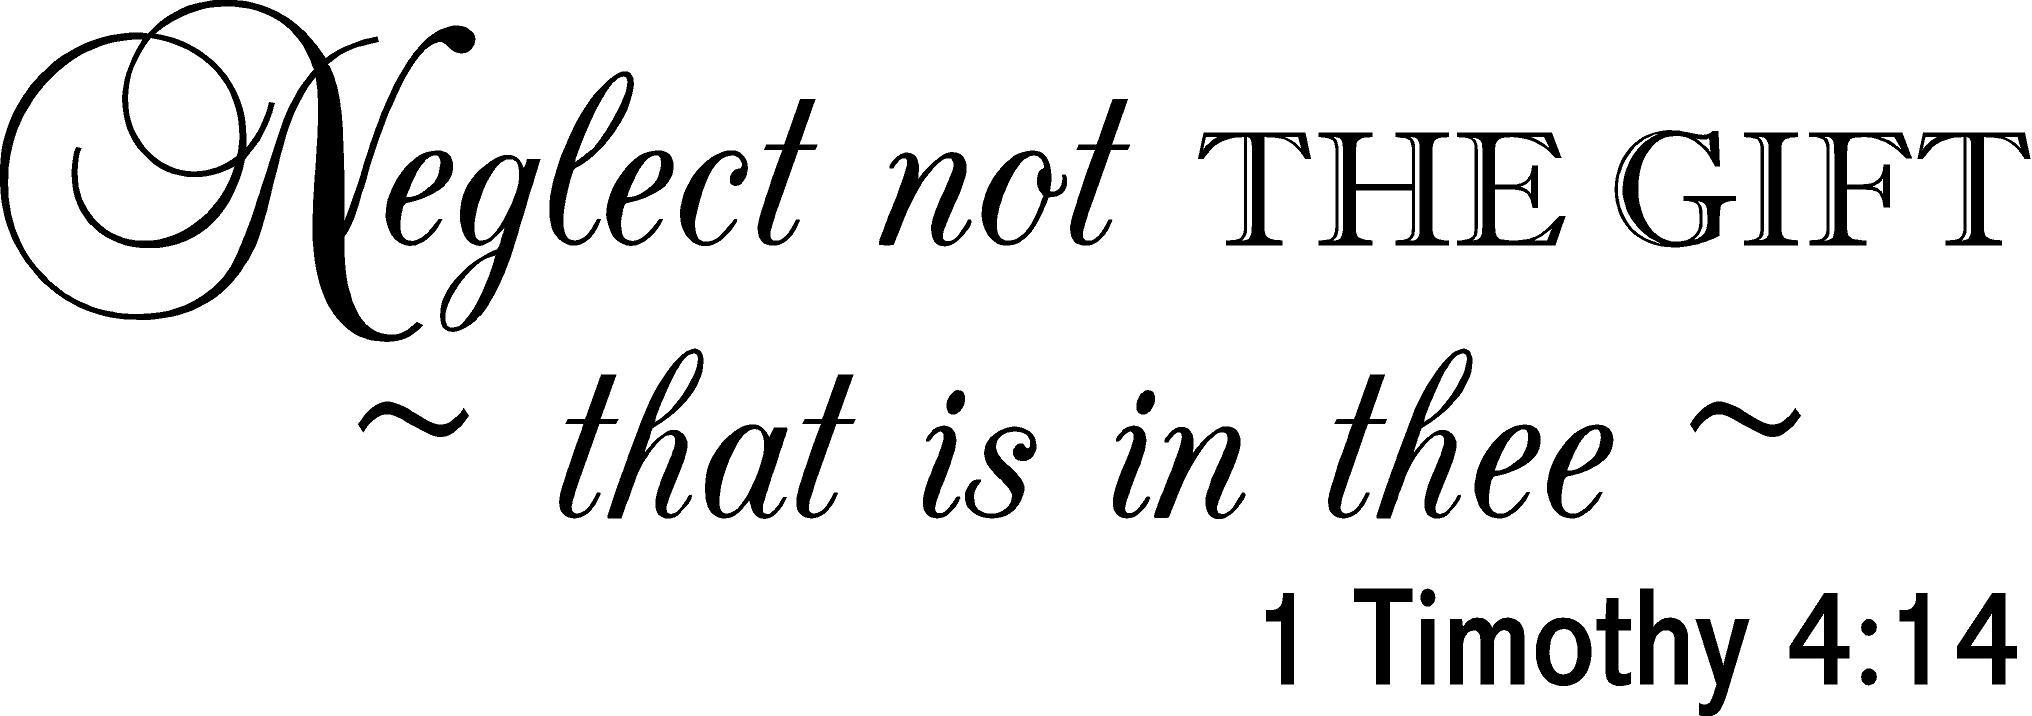 1 Timothy 4 14